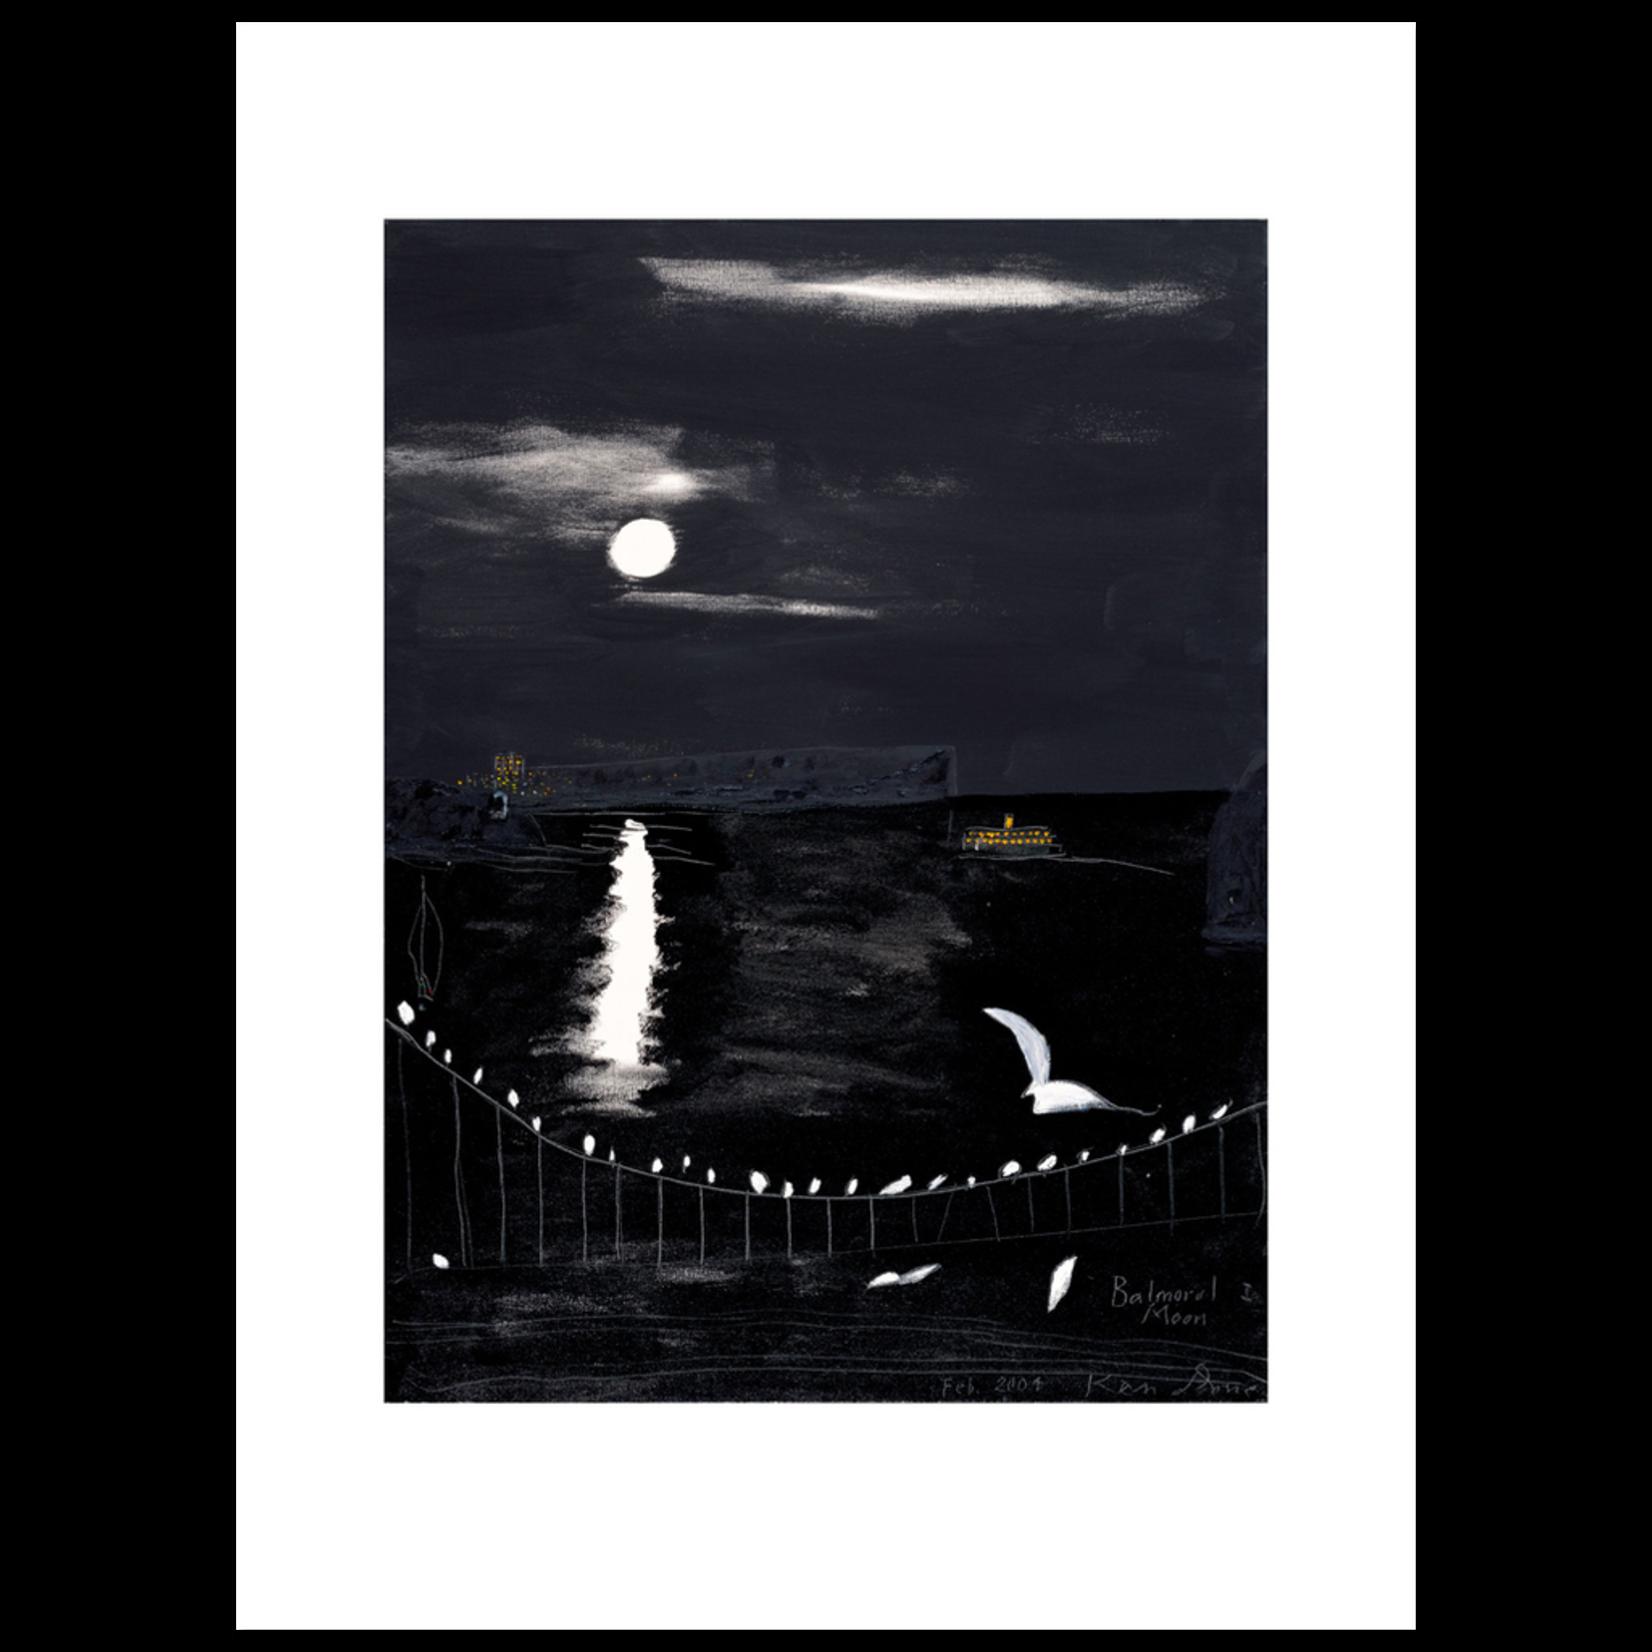 Limited Edition Prints Balmoral moon I, 2004